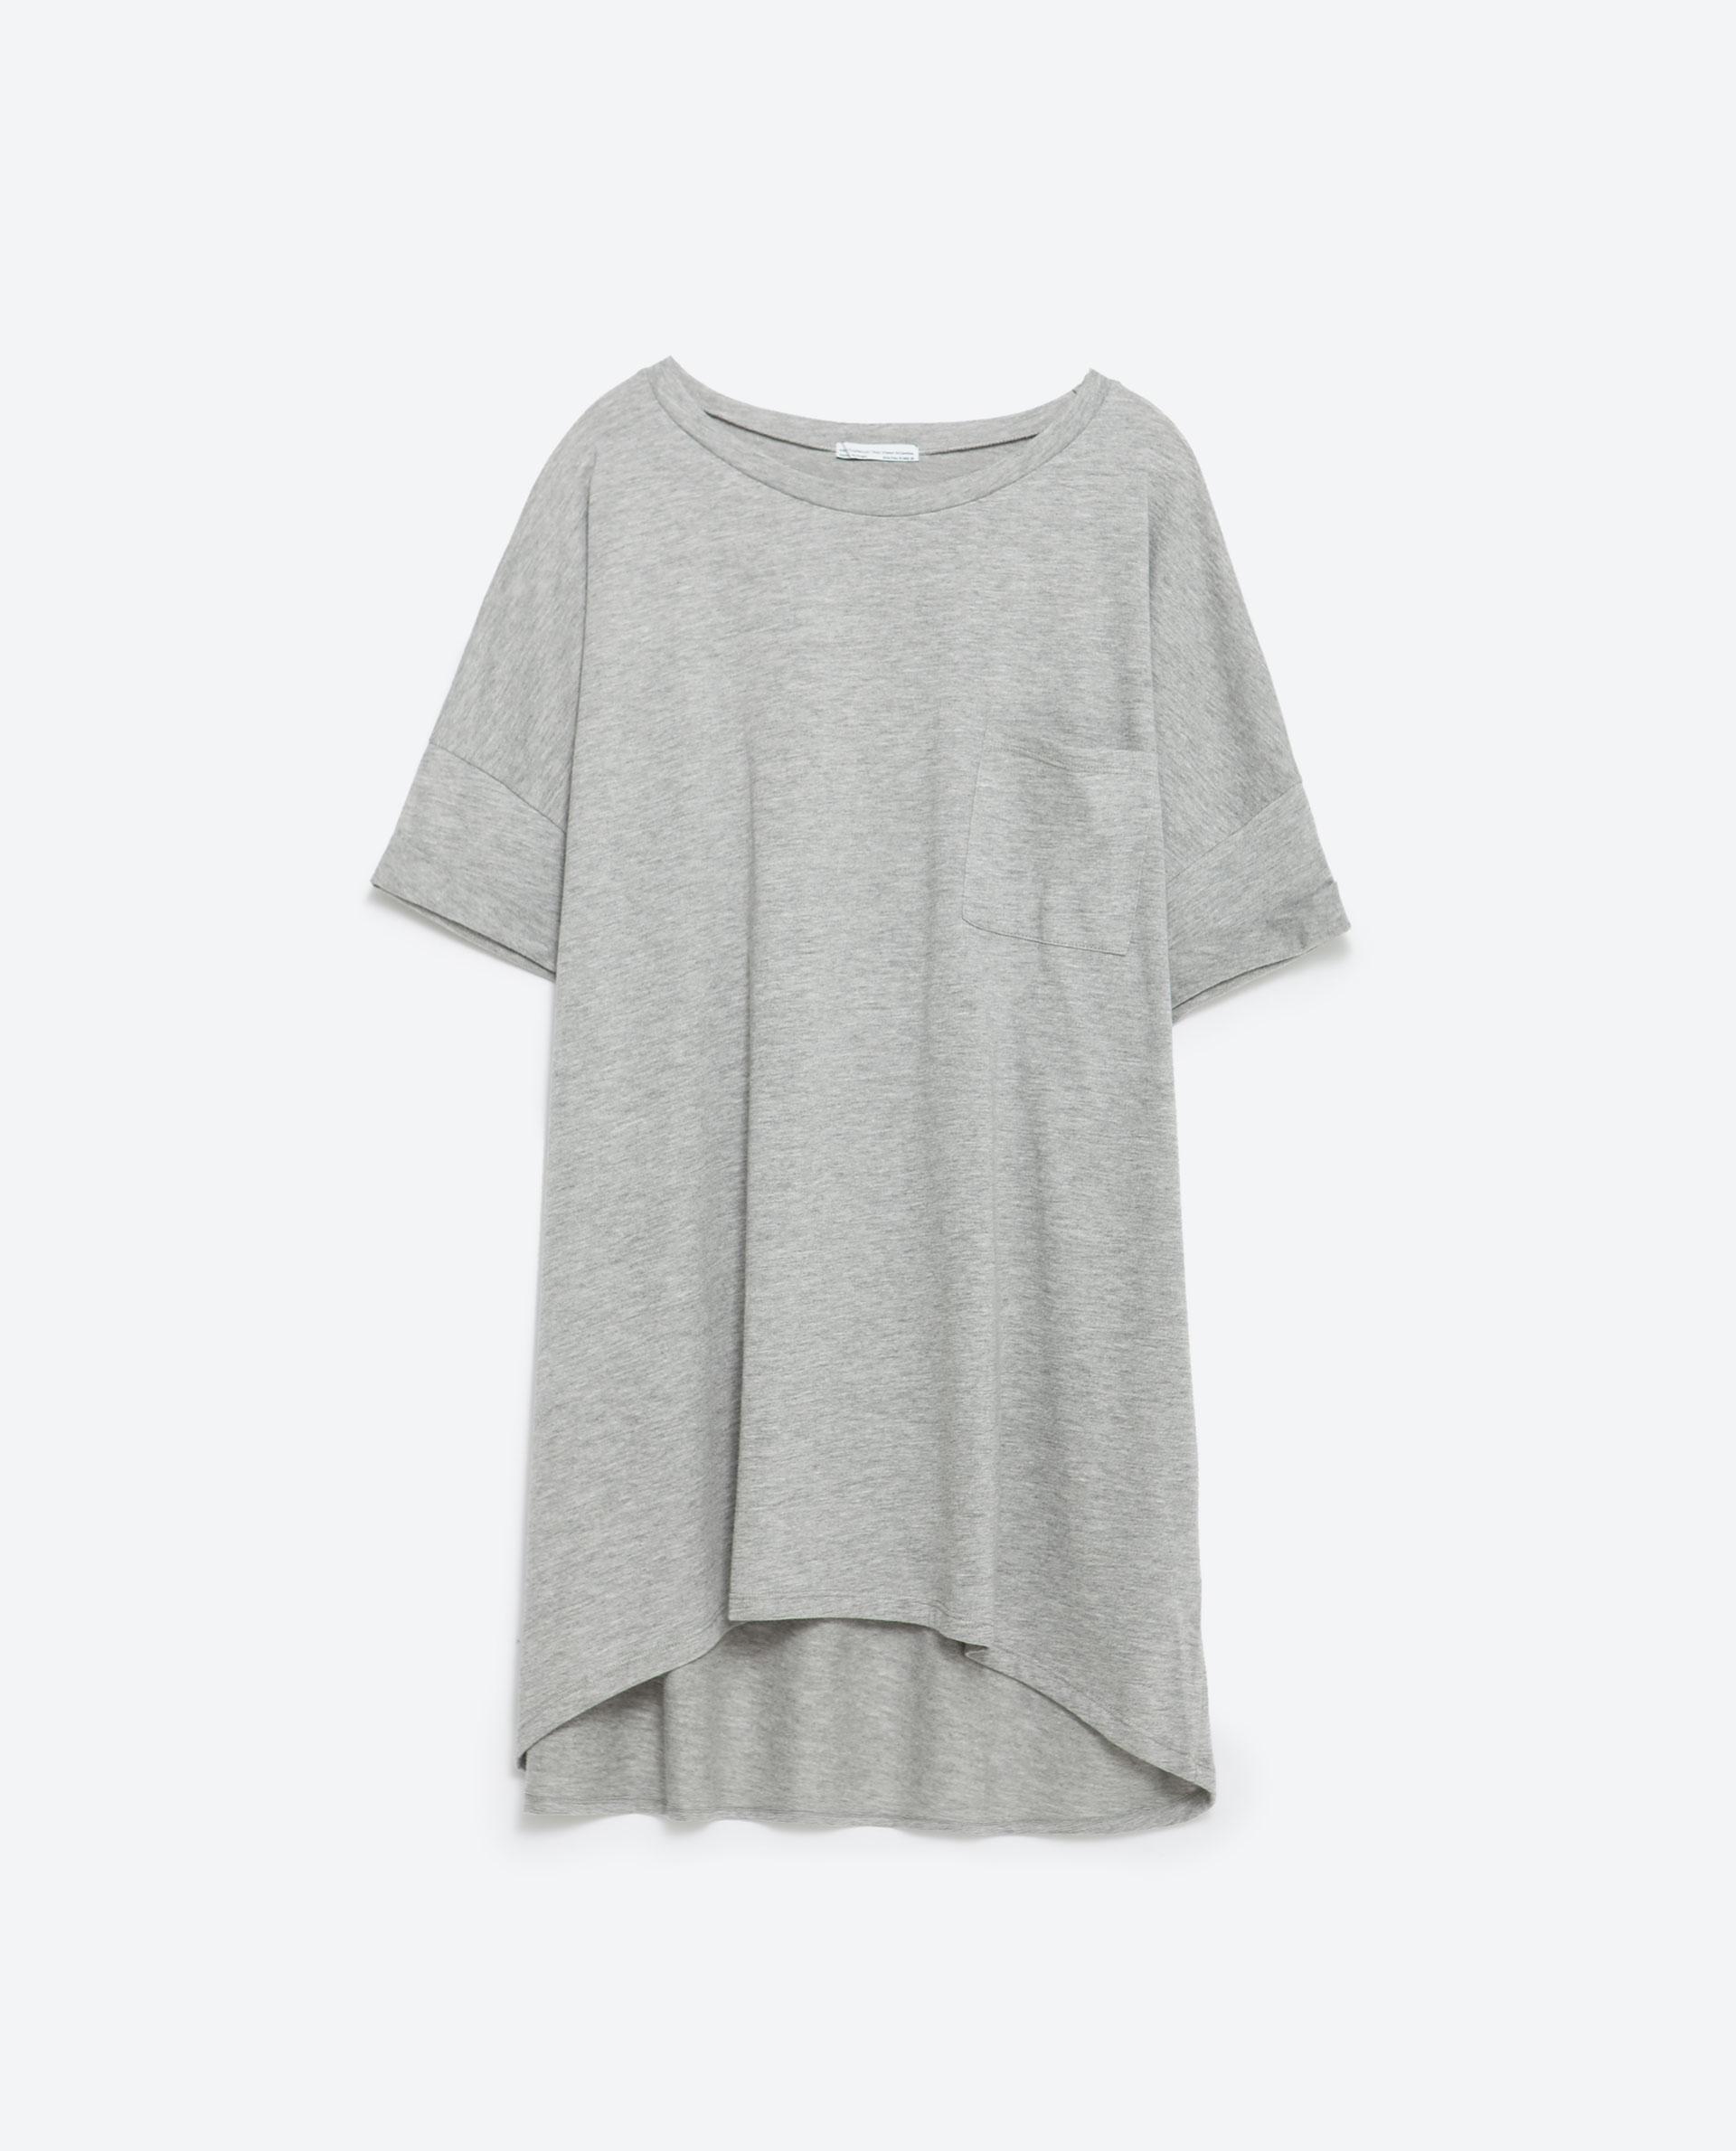 Zara oversized t shirt oversized t shirt in gray grey for Grey marl t shirt